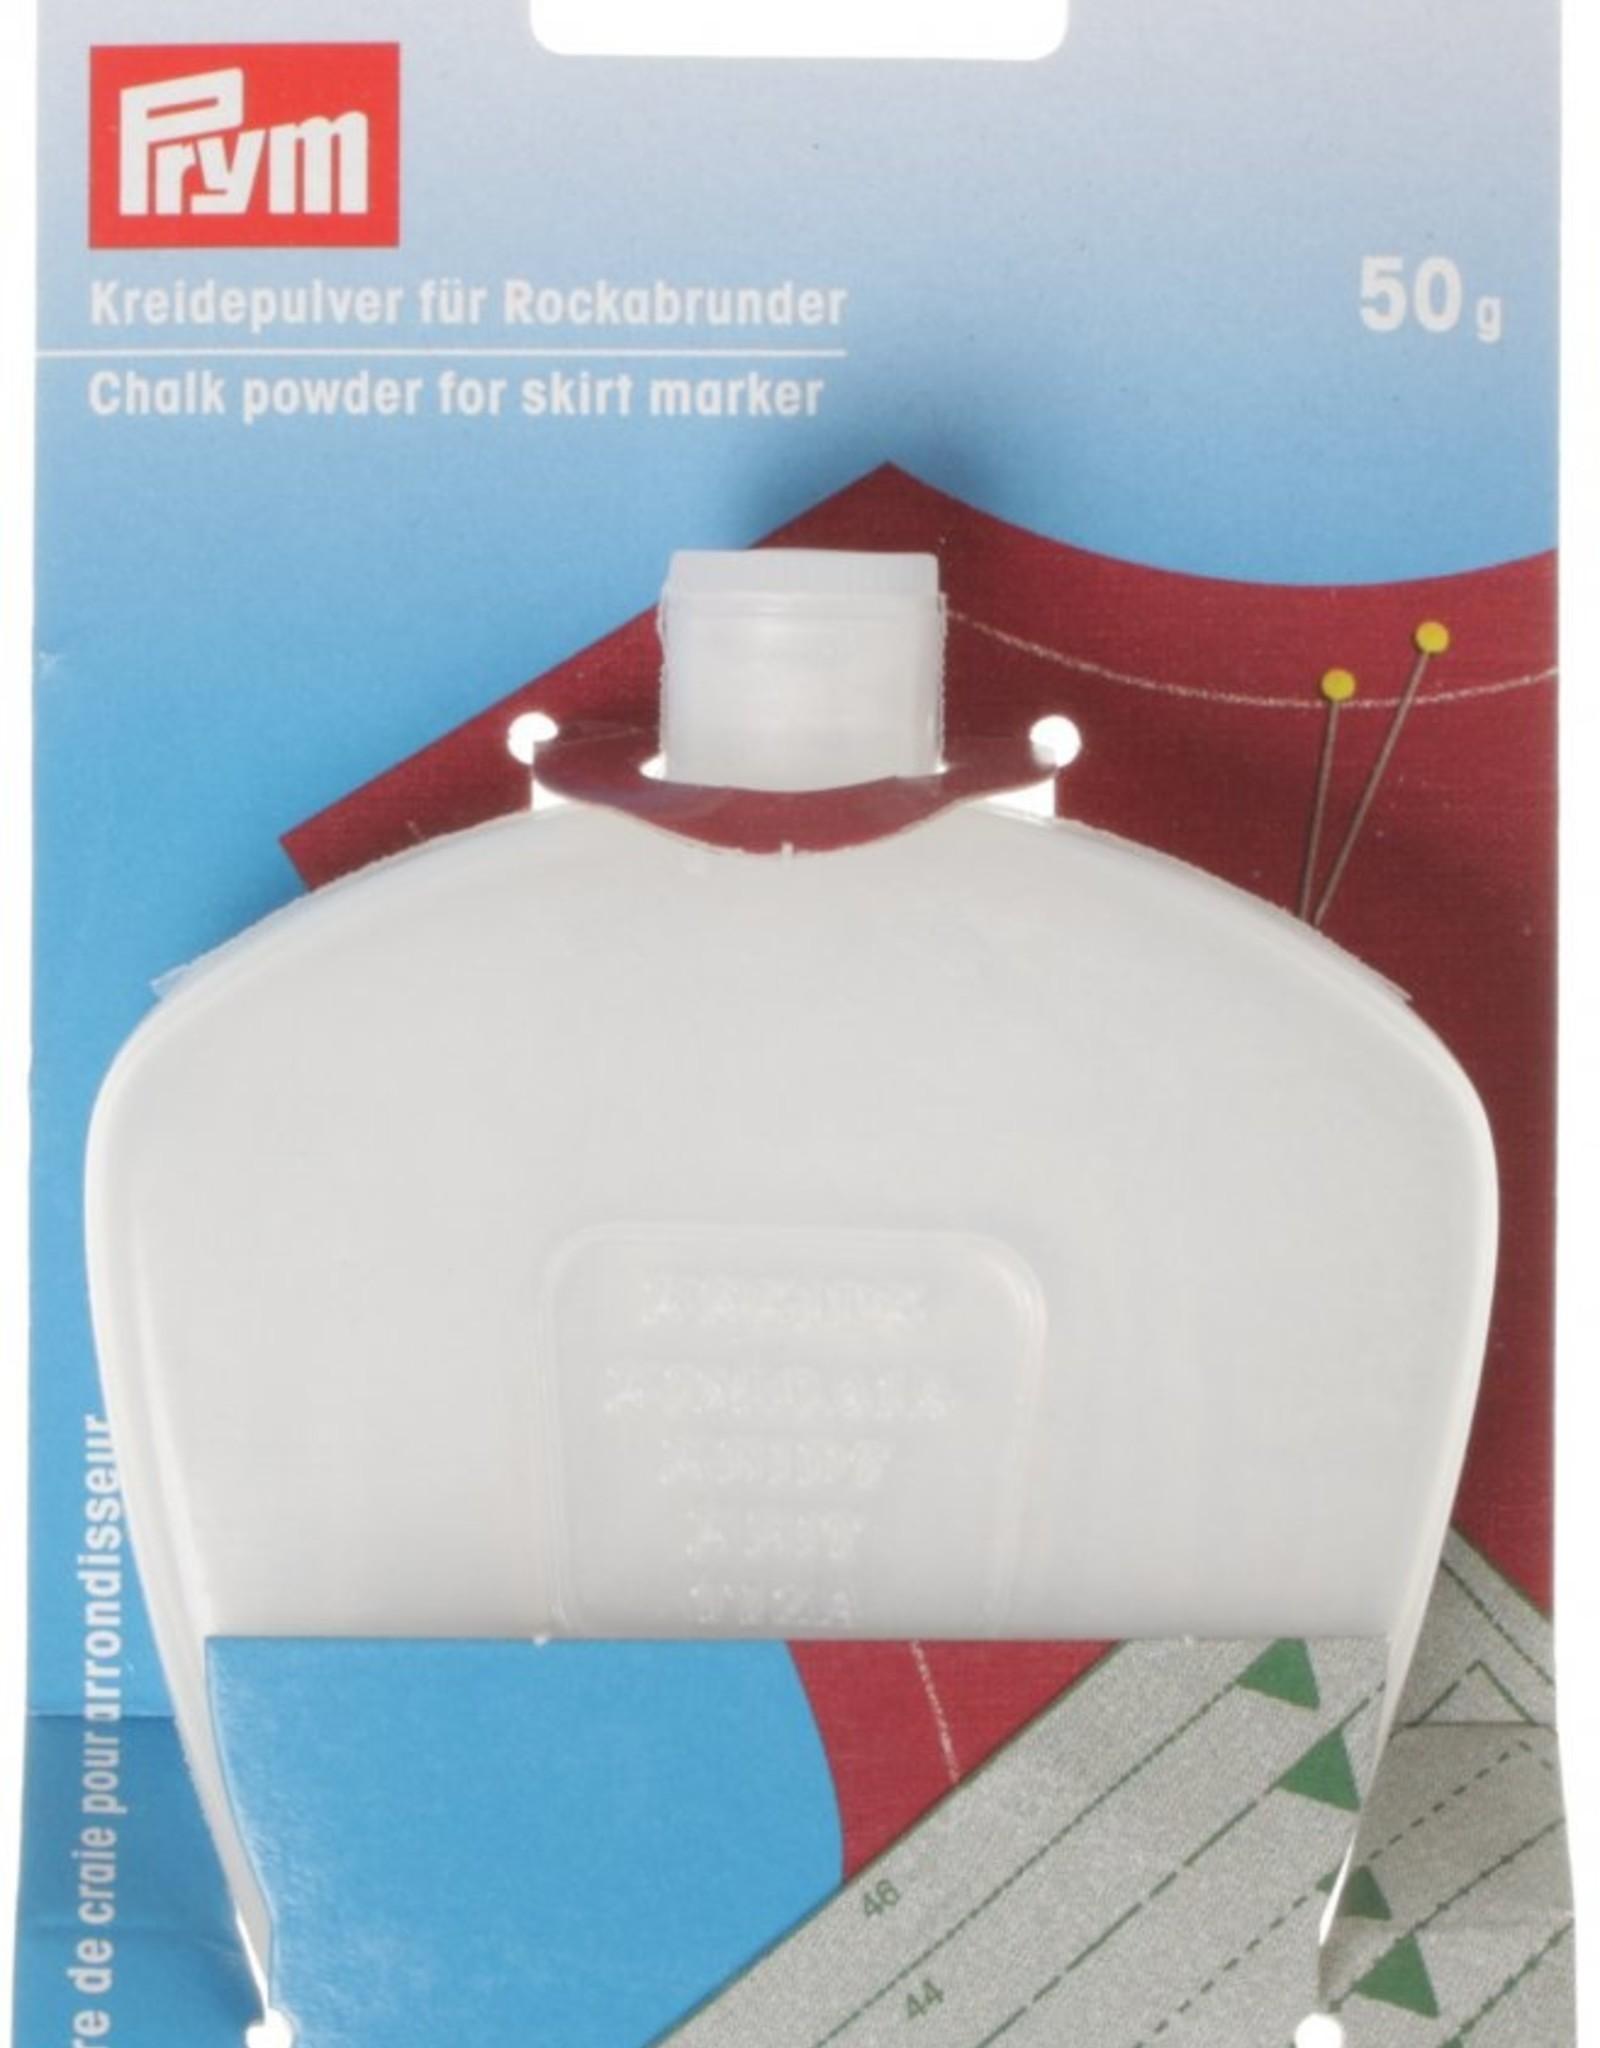 Prym Prym - krijtpoeder voor rokzoommeter 50g - 611 886